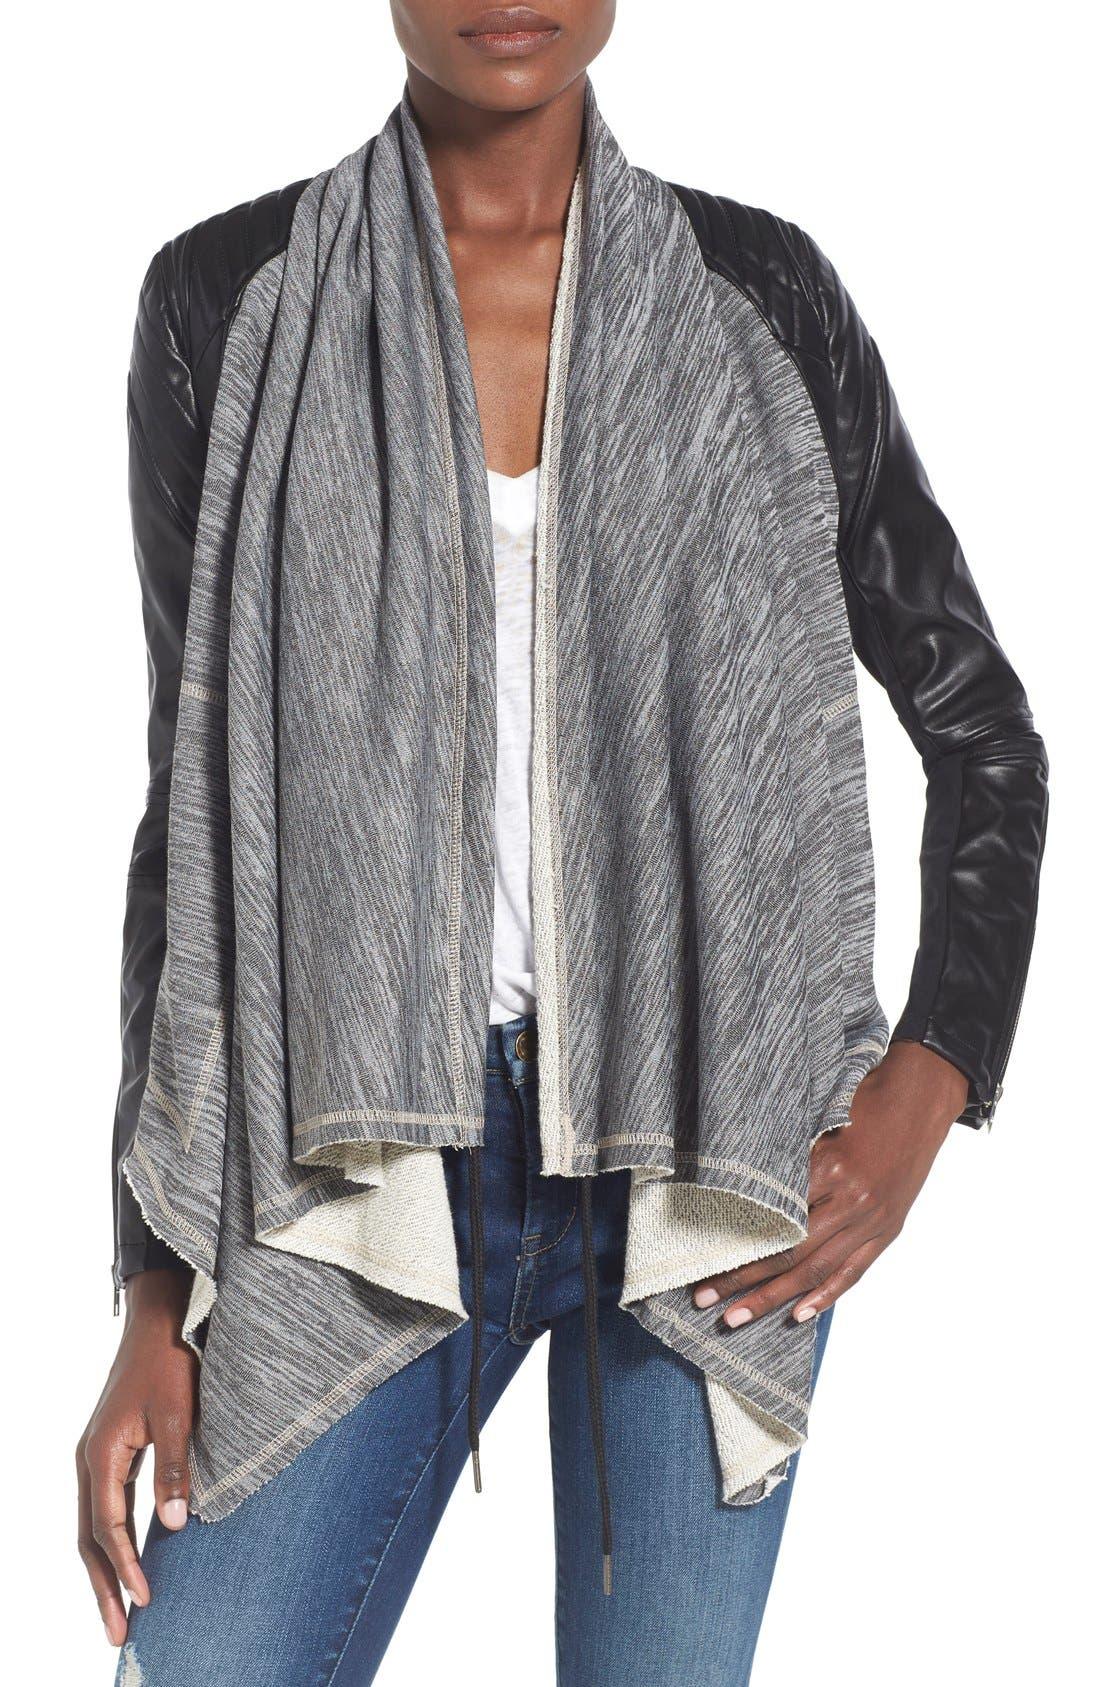 Alternate Image 1 Selected - BLANKNYC 'Dating & Waiting' Drape Front Jacket